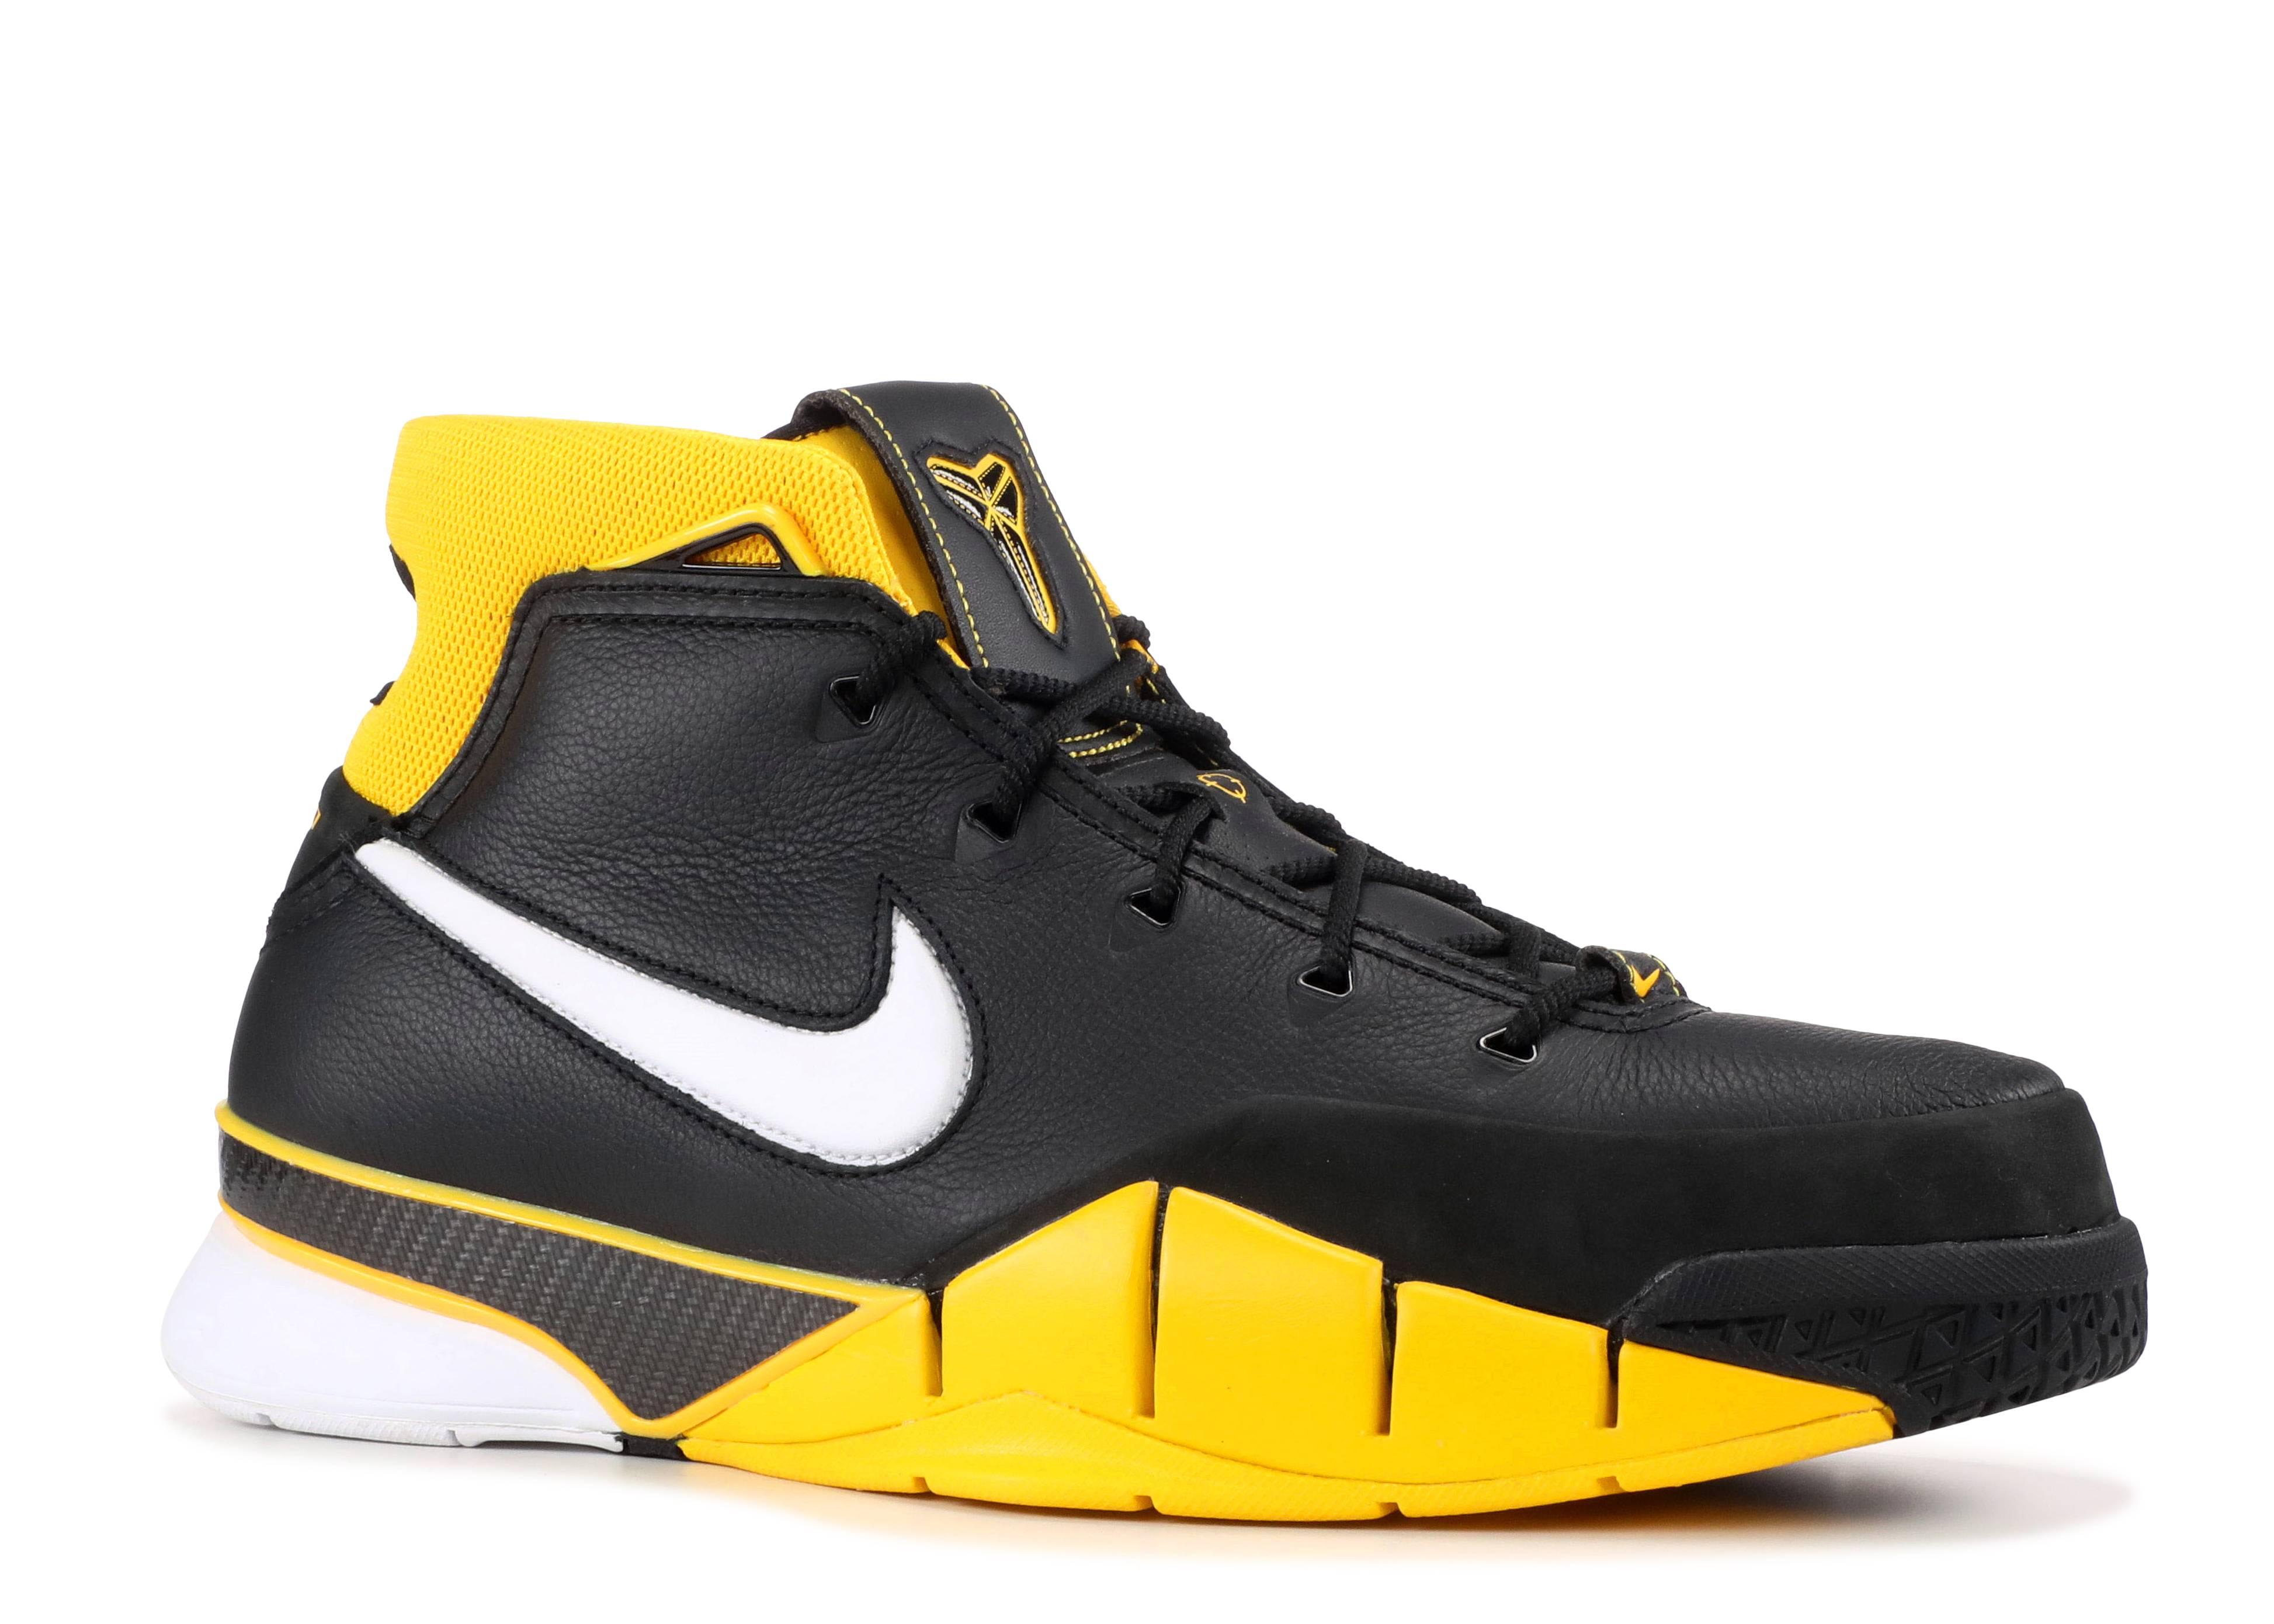 Kobe 1 Protro - Nike - AQ2728 003 - black.white-varsity maize ... a9c3abd156